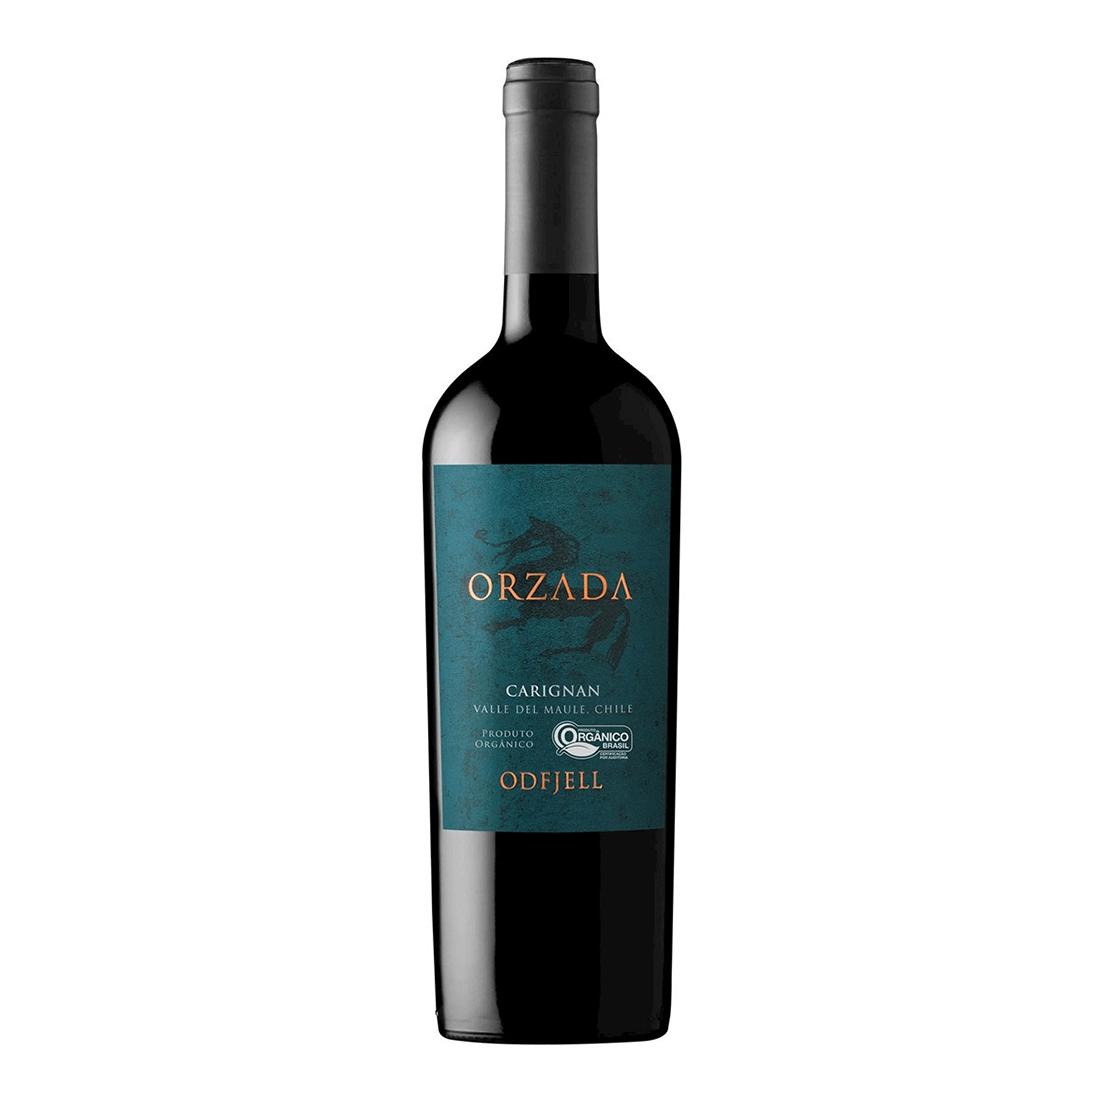 Vinho Odfjell Orzada Carignan 750 ml